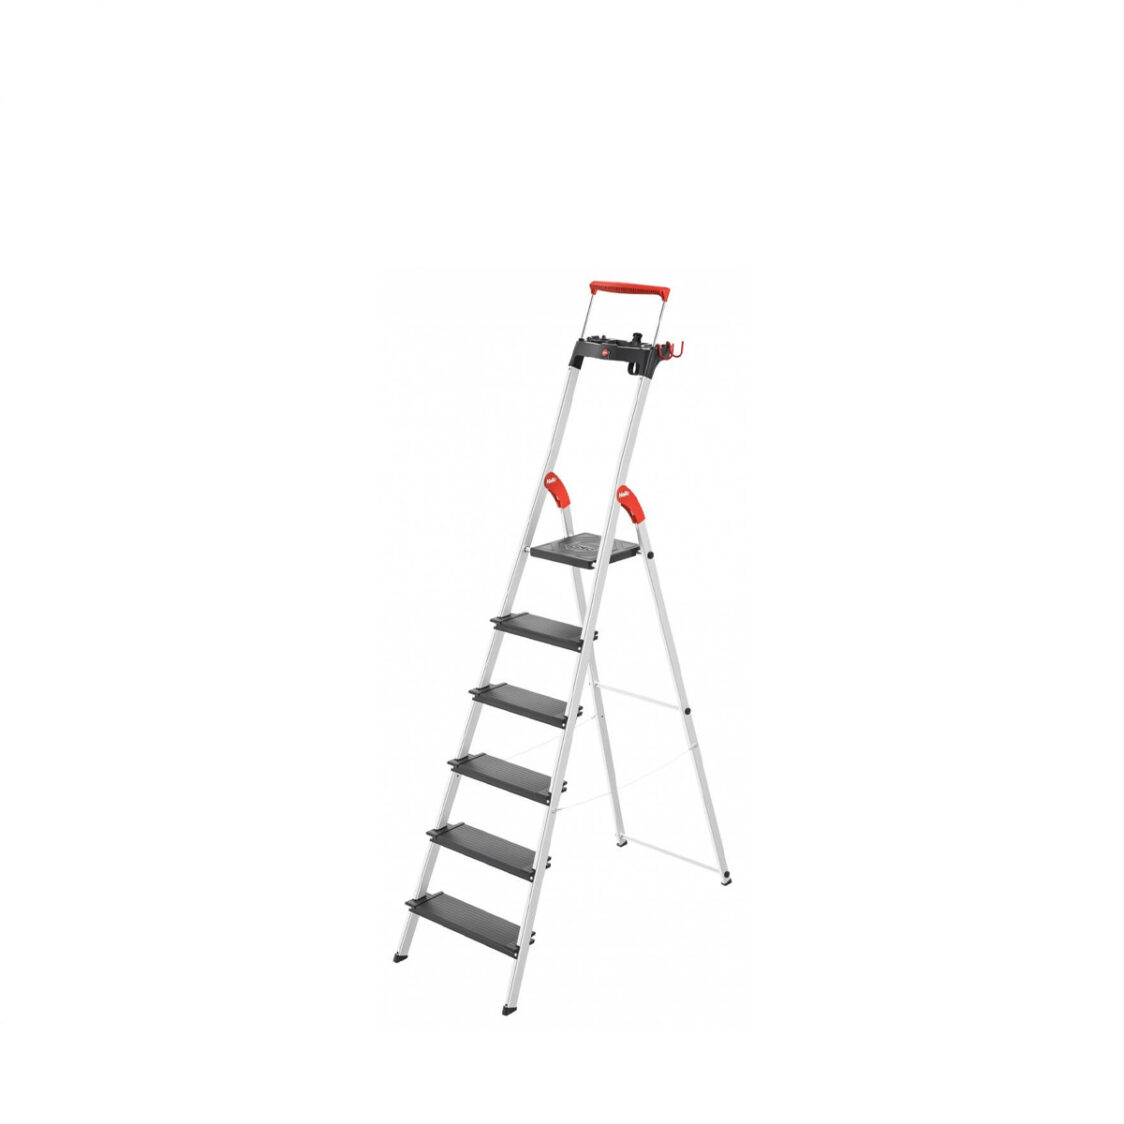 Hailo SL100 Topline Safety Ladder - 6 Steps H8050-607